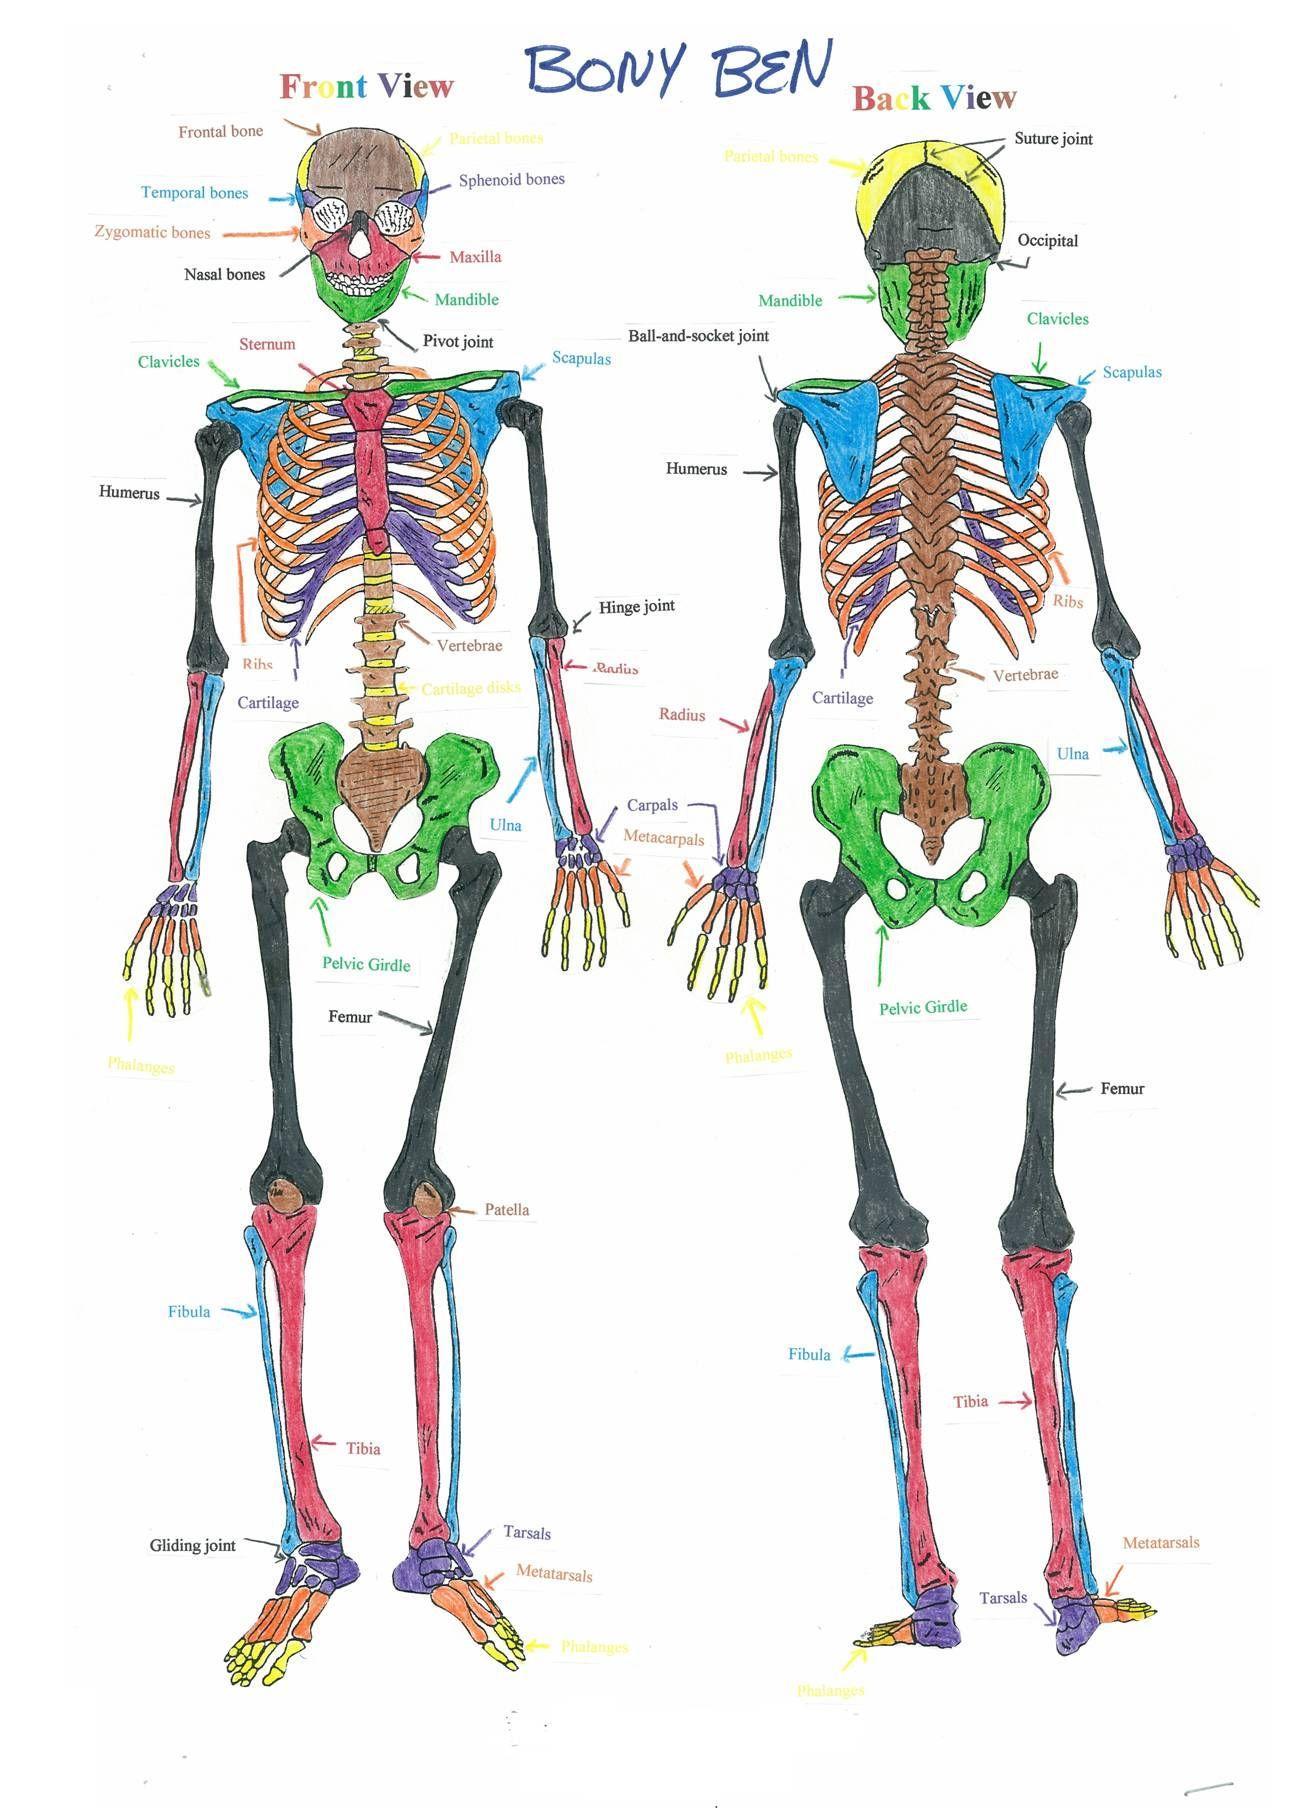 Colorful Skeleton Diagram House Wiring Diagram Symbols